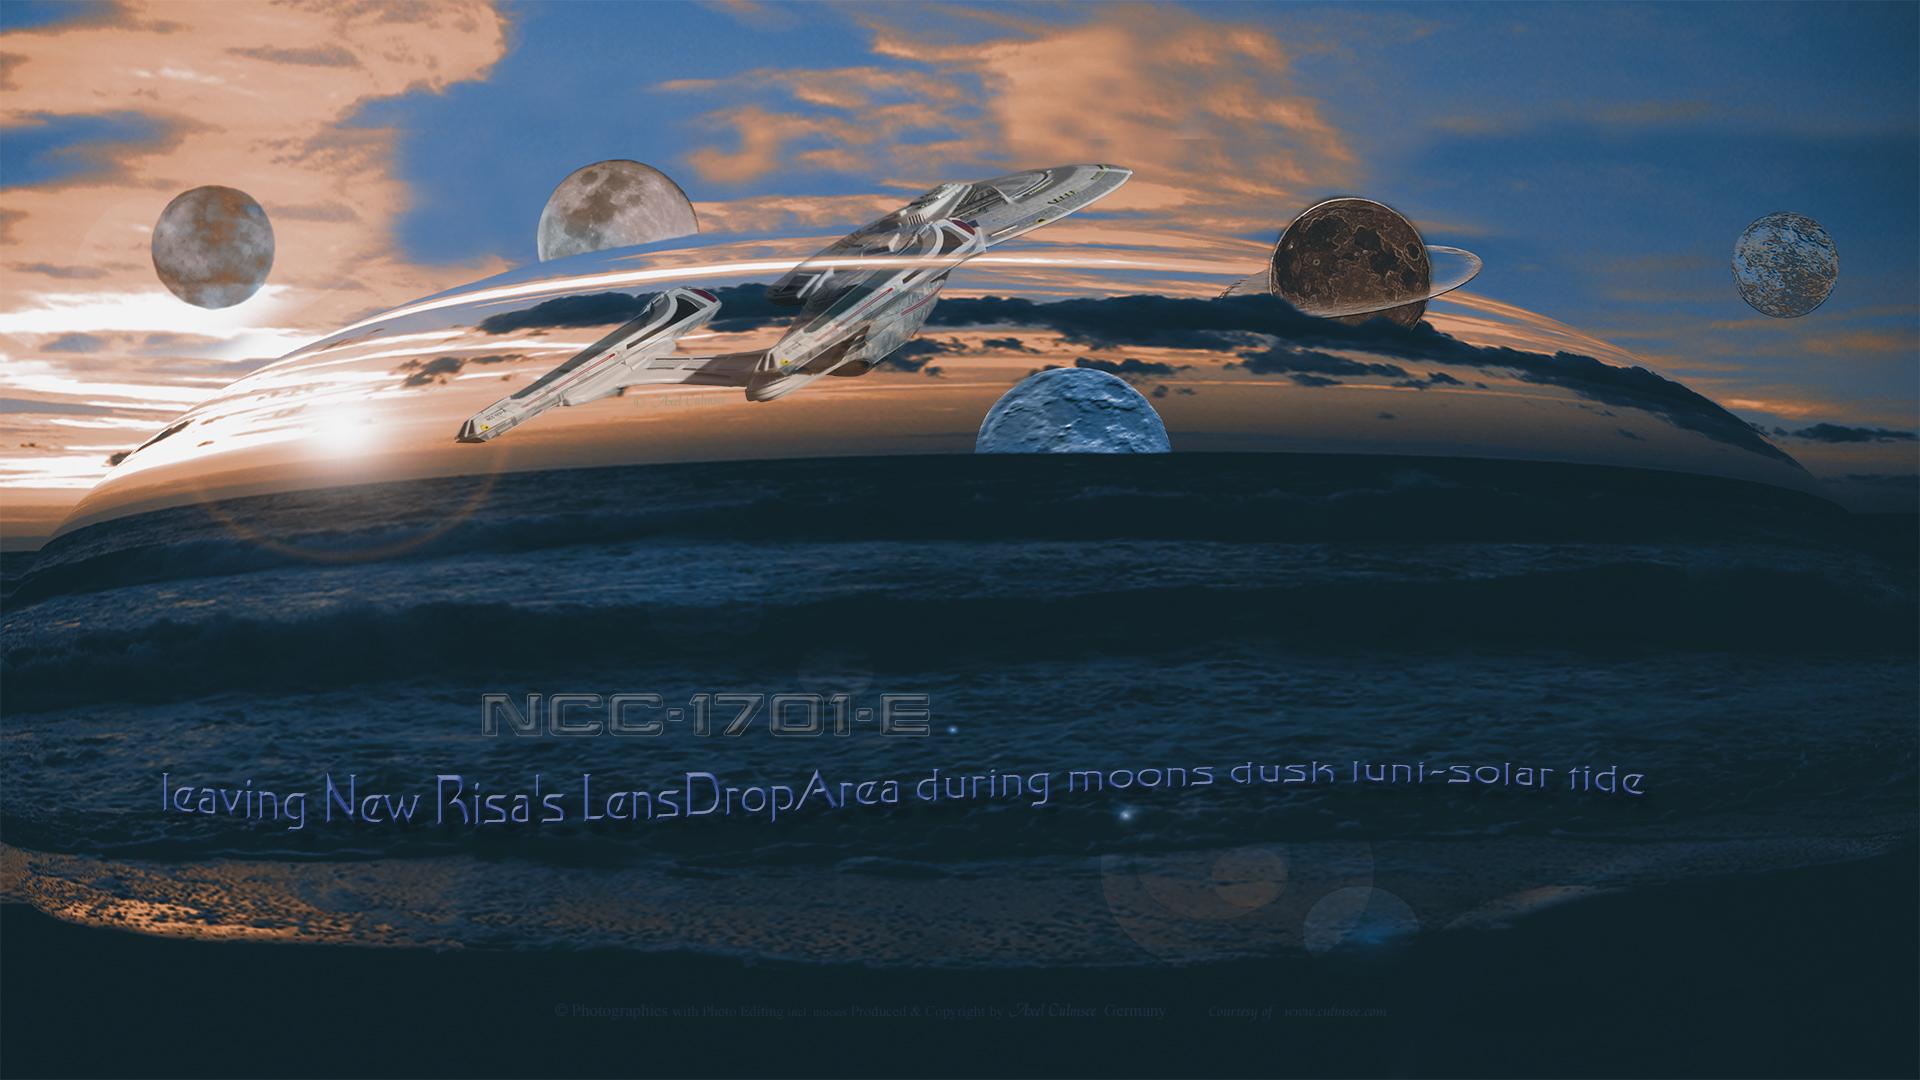 Enterprise-E leaving New Risa's LensDropArea during moons dusk luni-solar tide